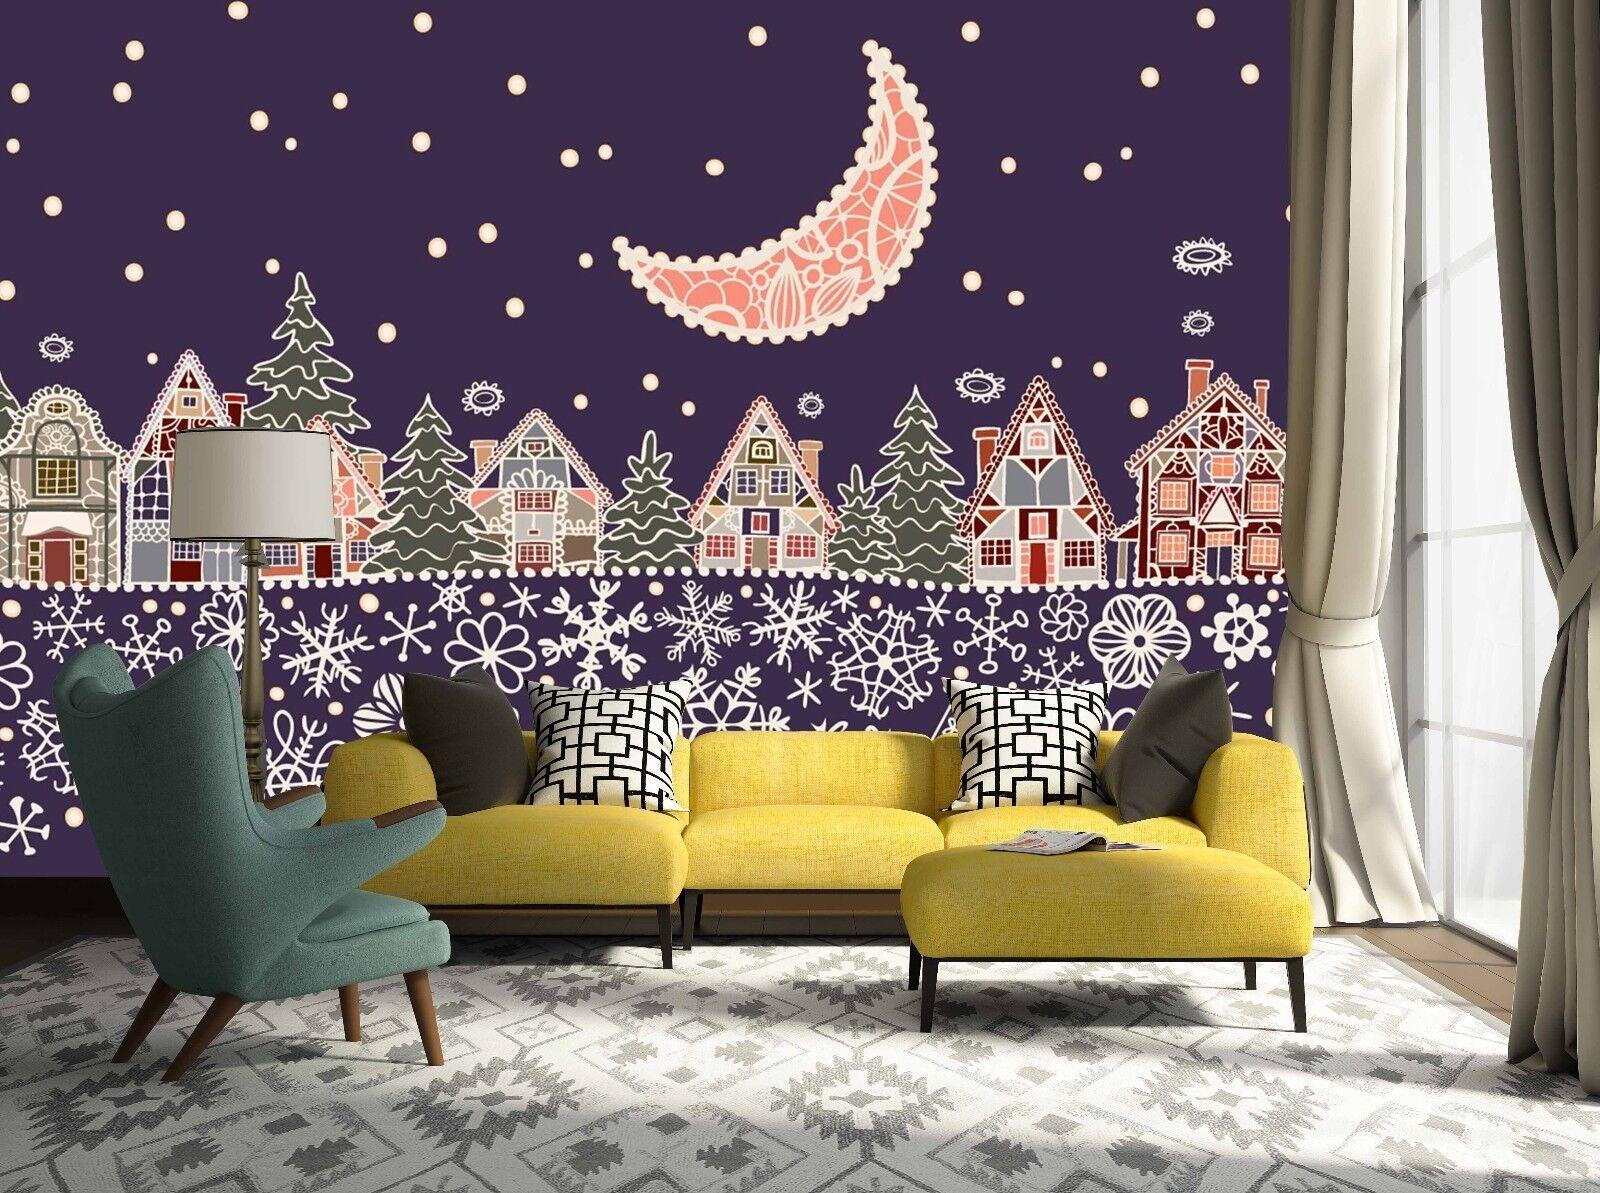 3D Christmas Moon Graffiti Wall Paper Print Decal Wall Deco Wall Indoor Murals